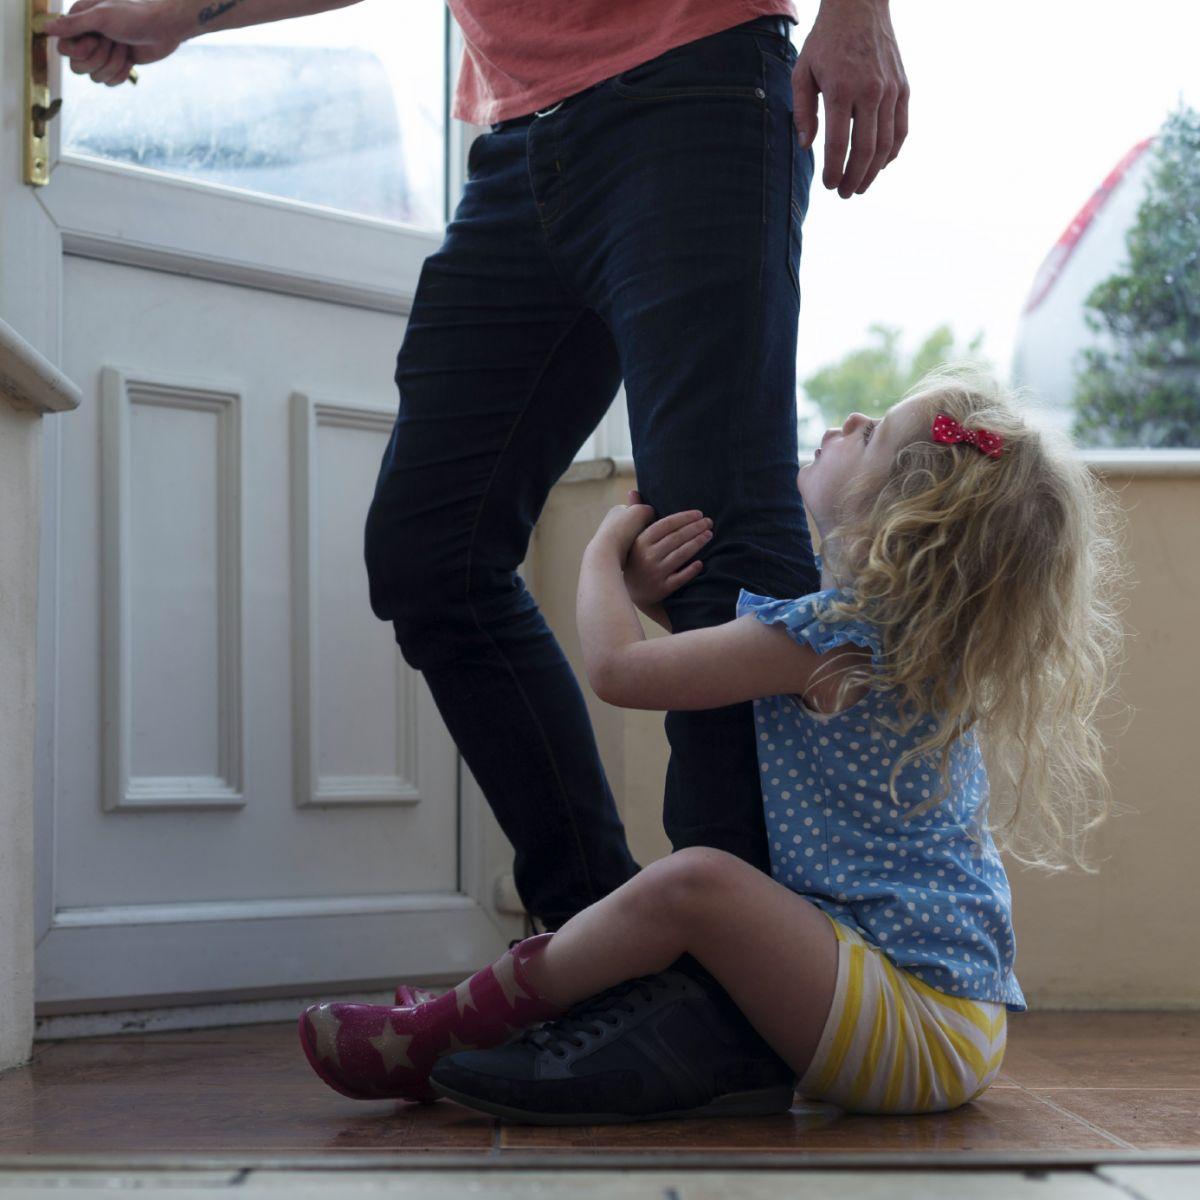 copilul cand ai musafiri totul despre mame